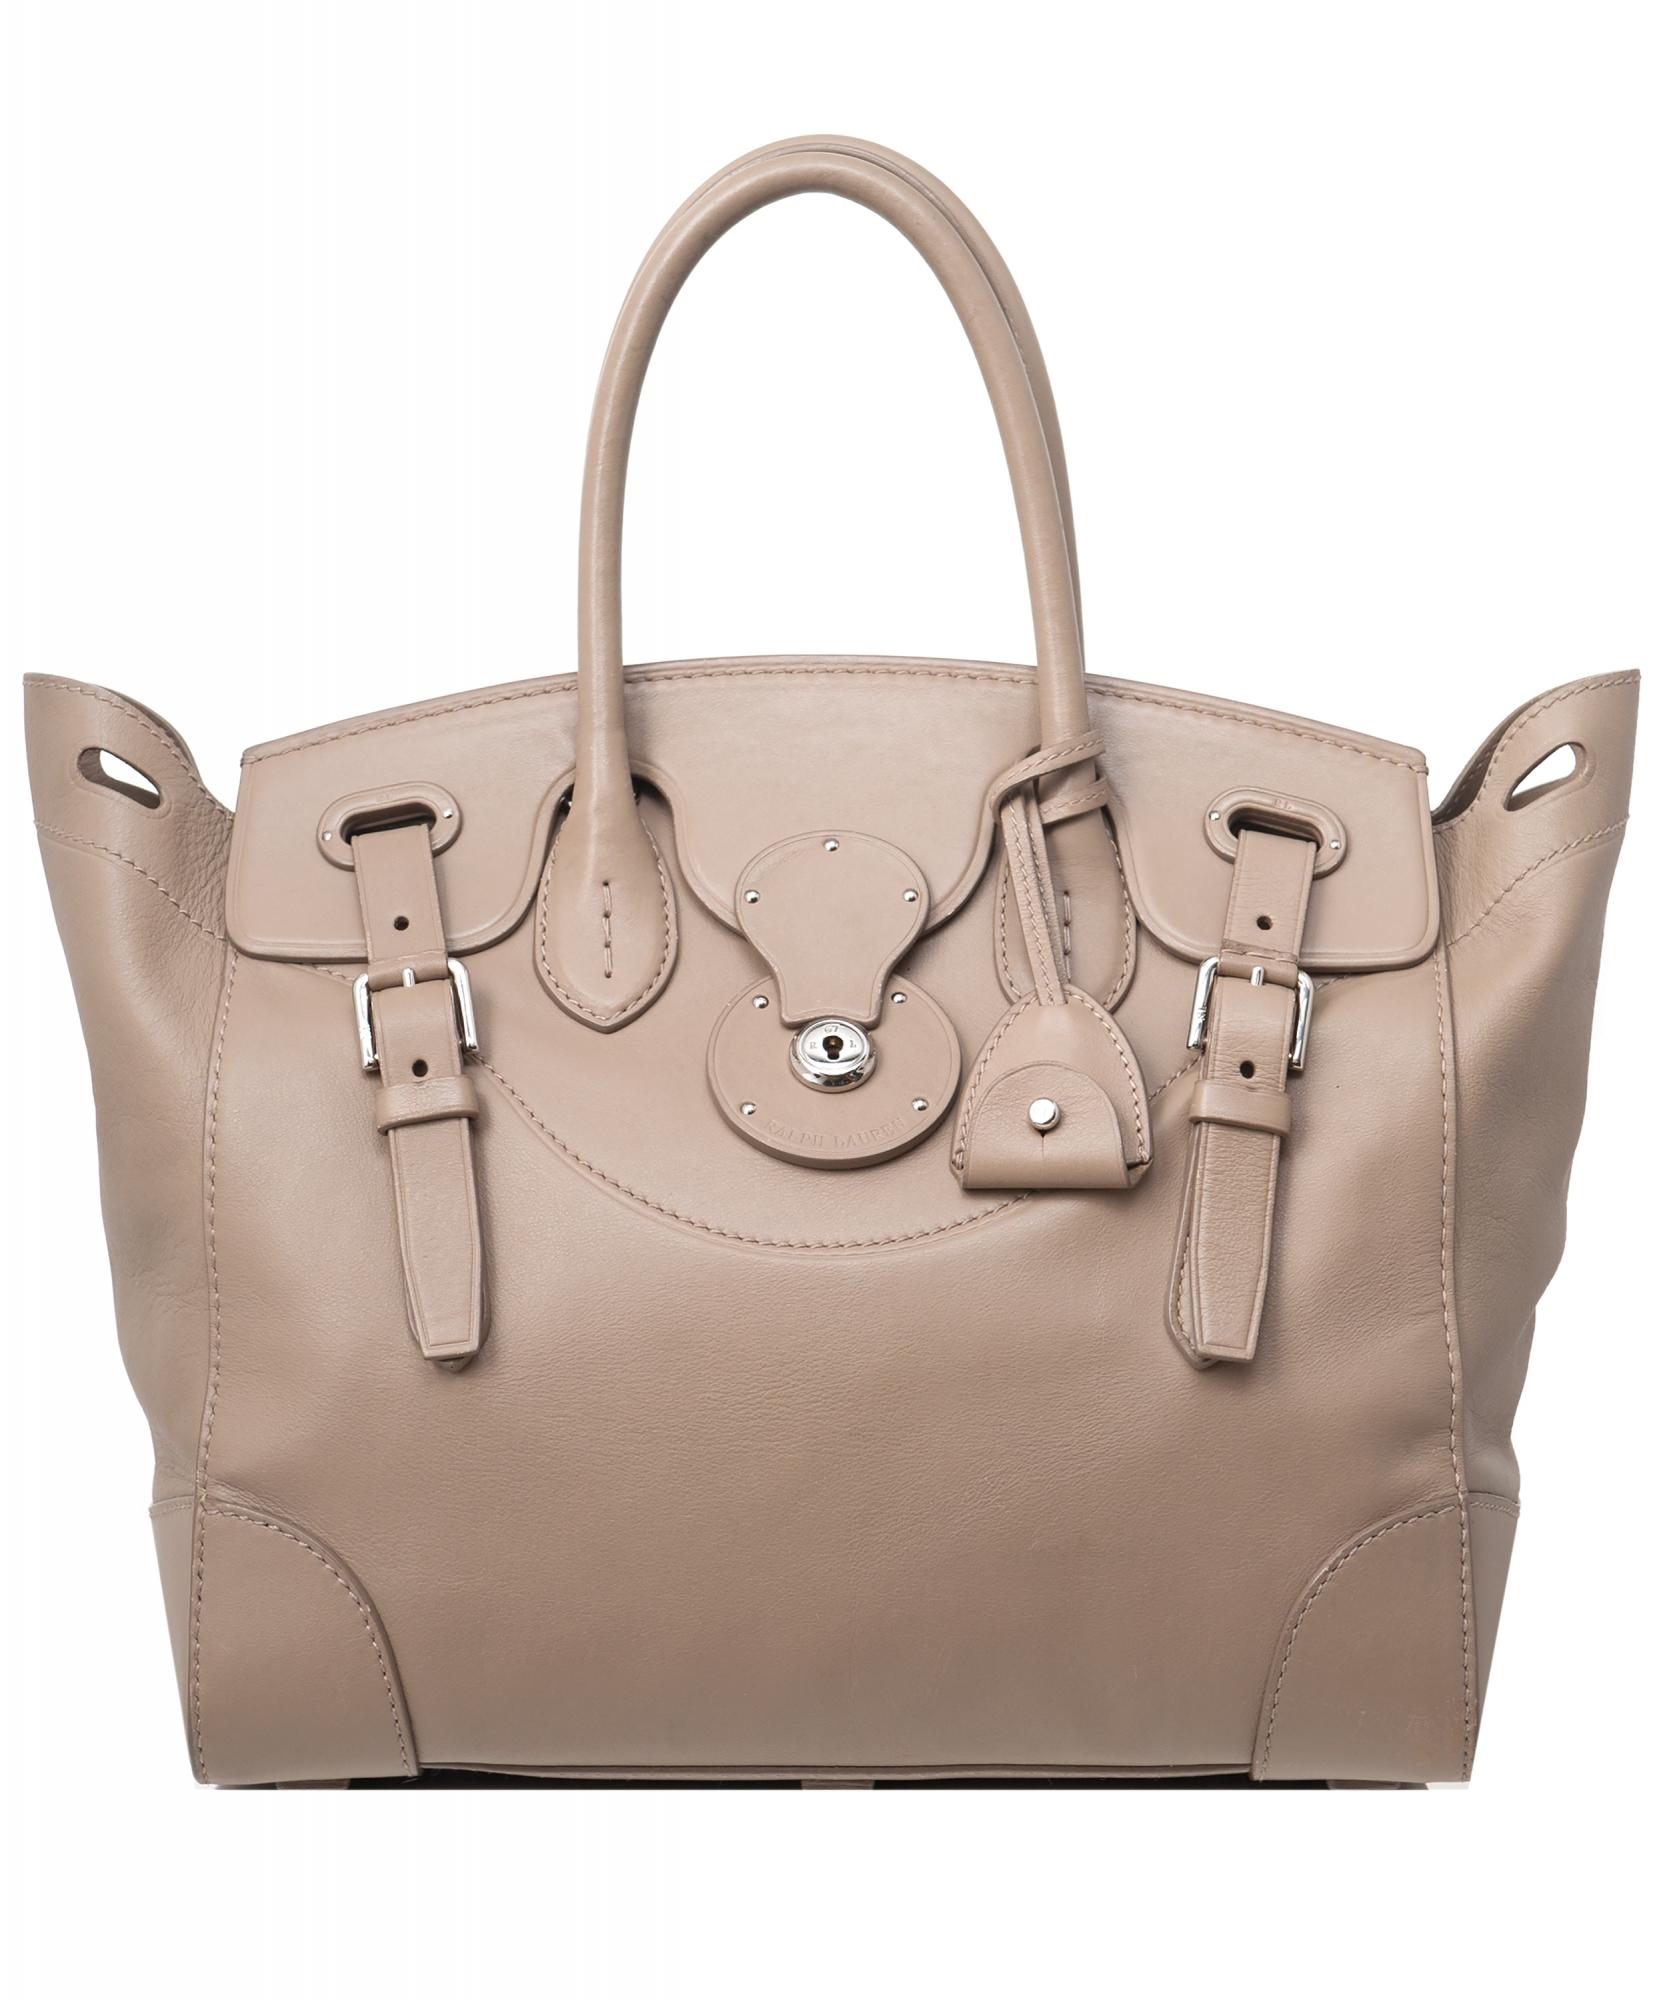 Ralph Lauren Taupe Soft Ricky Bag